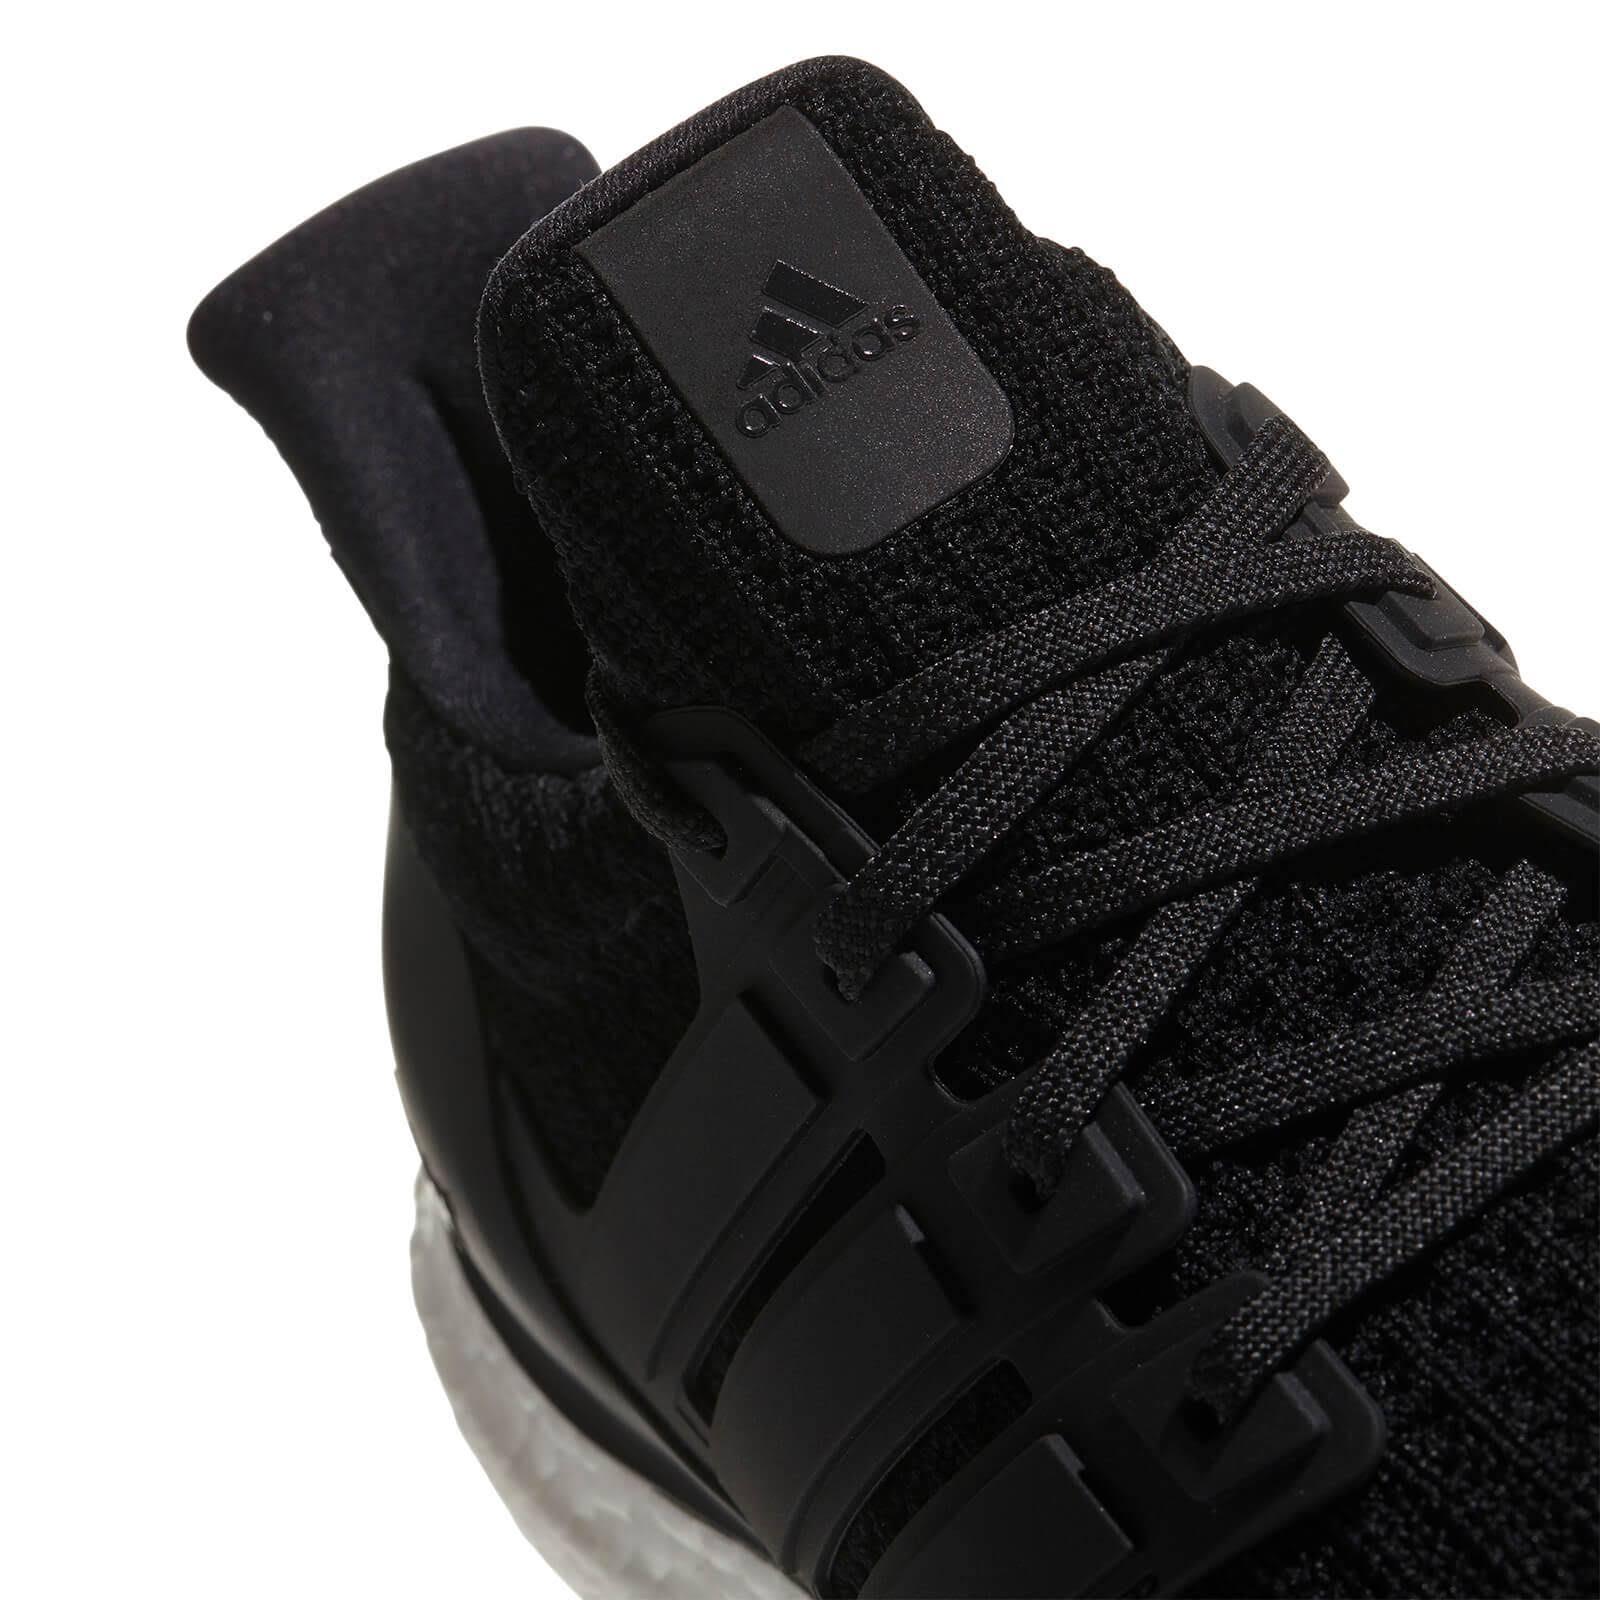 Ultra Boost Core UomoBlack Adidas Per I6vfgY7yb